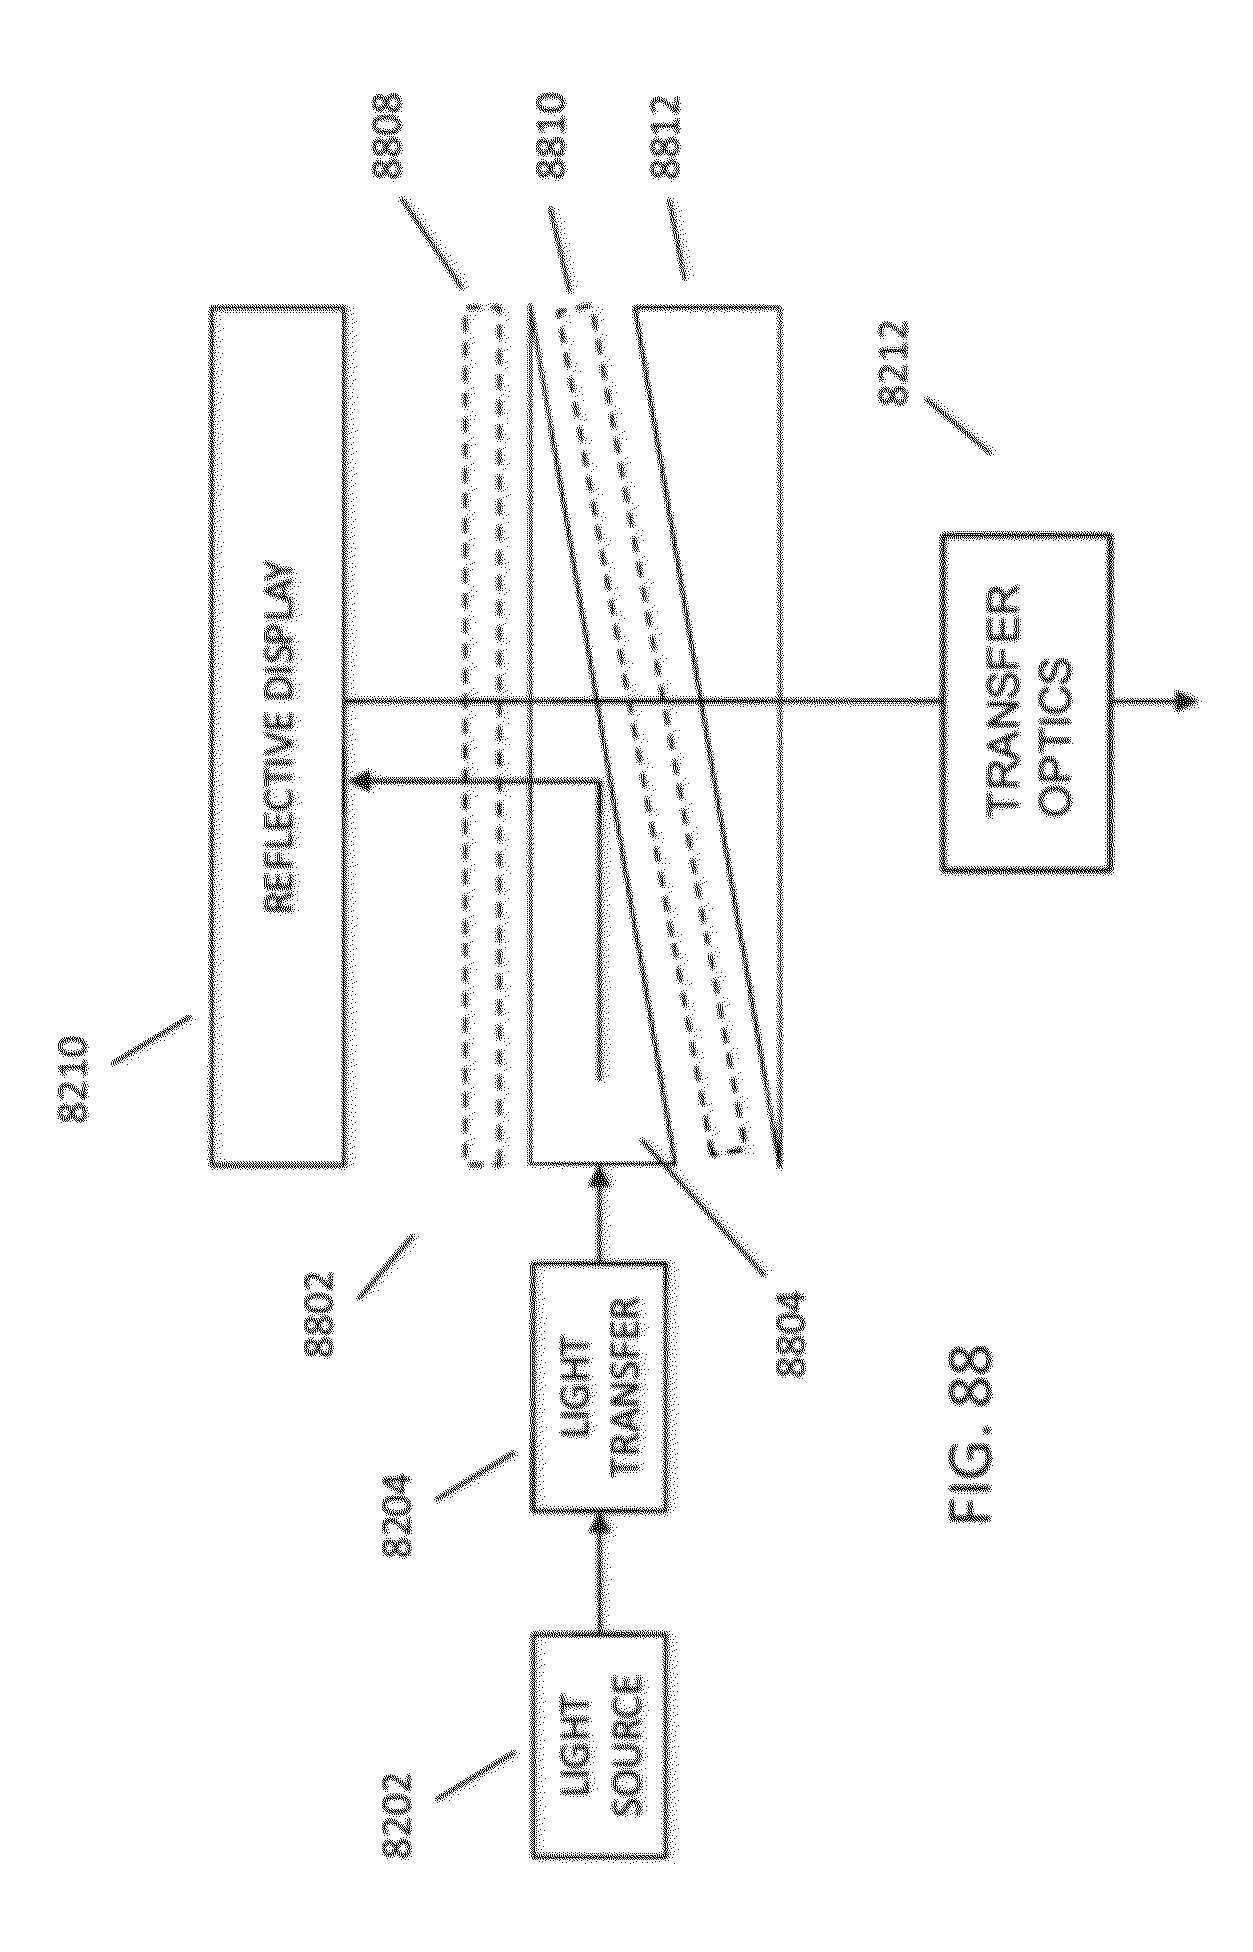 Patent US 9,134,534 B2